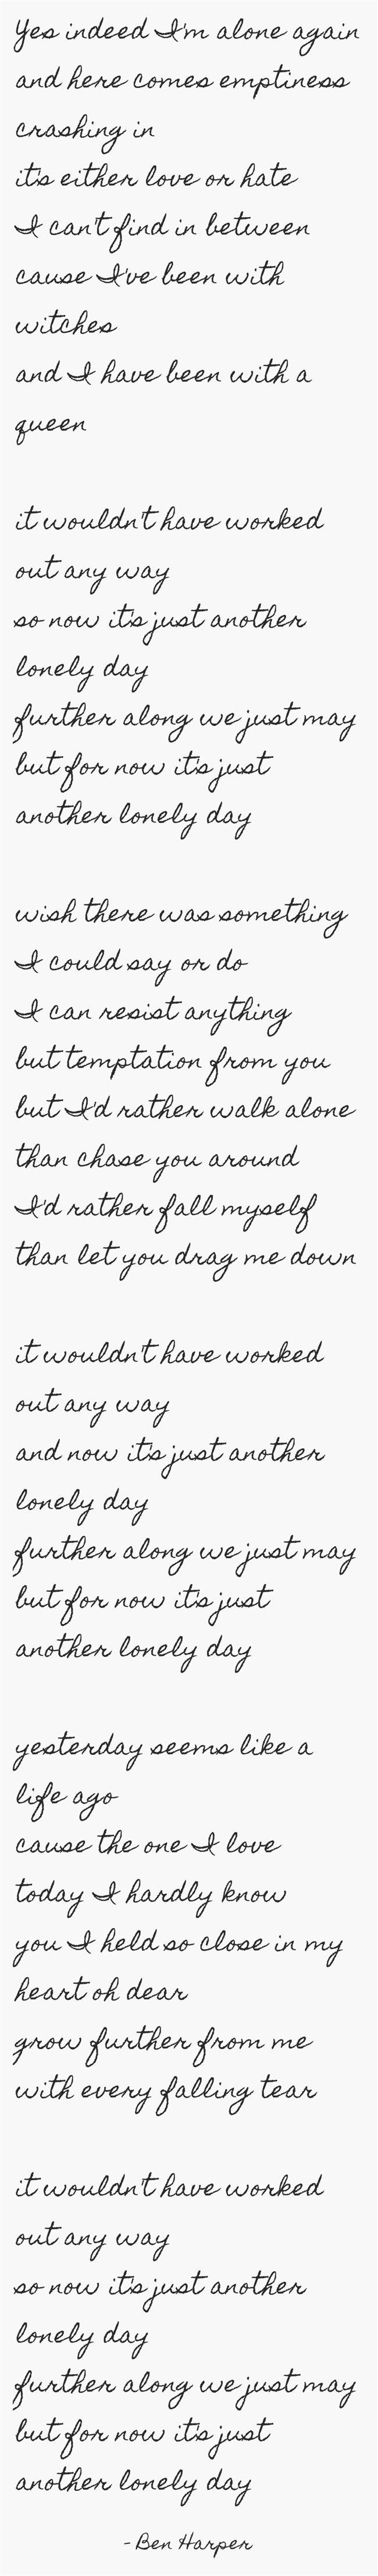 best Music lyrics images on Pinterest